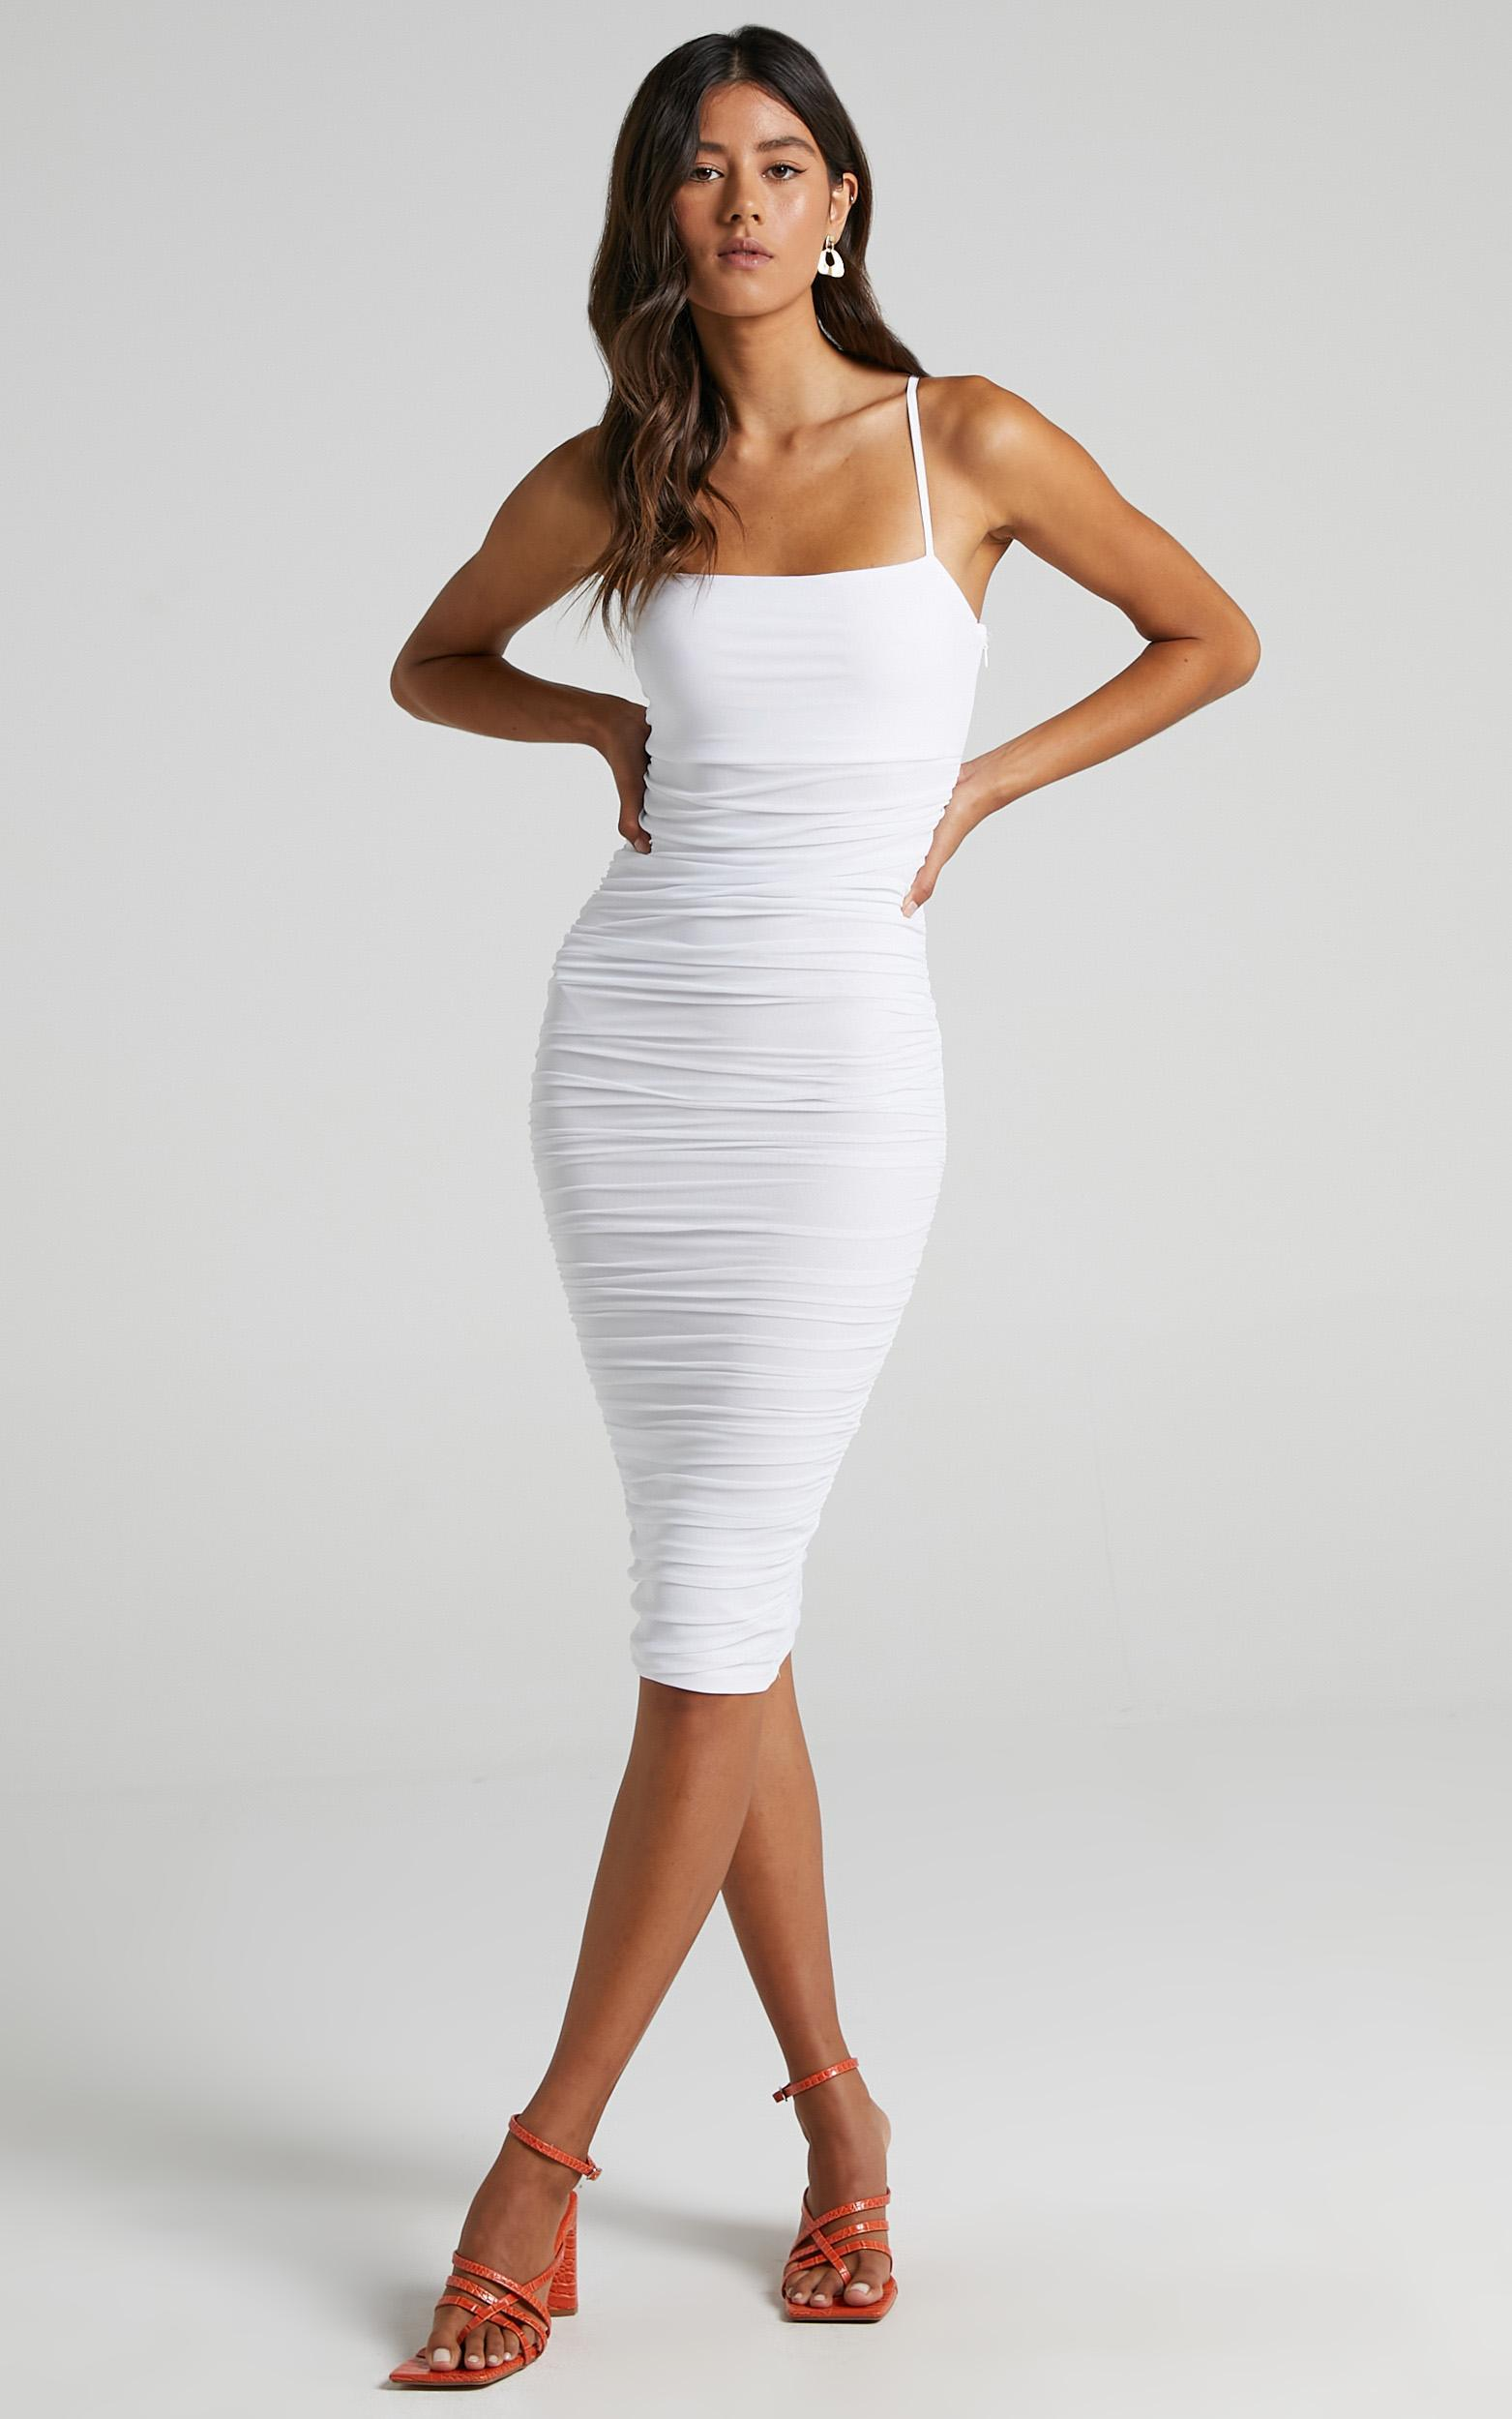 White mesh dress from Showpo